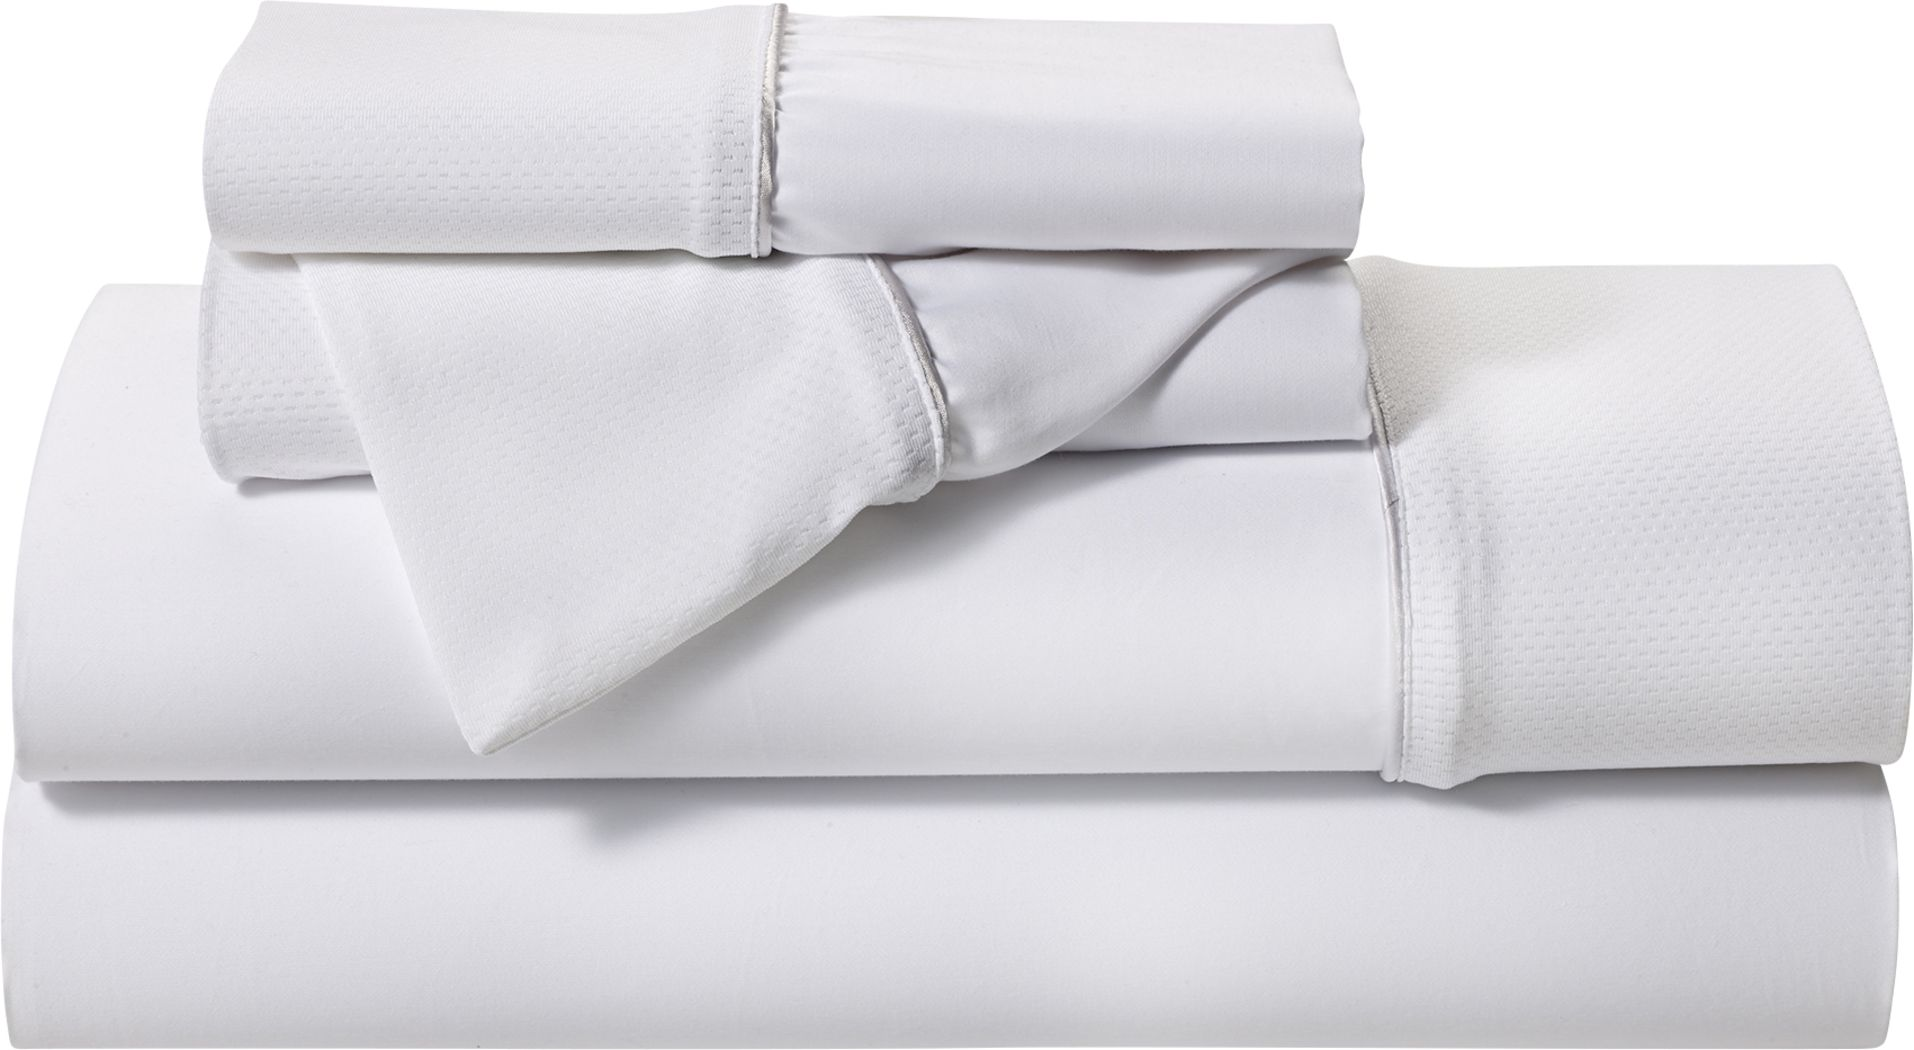 BG Basic White 3 Pc Twin XL Bed Sheet Set